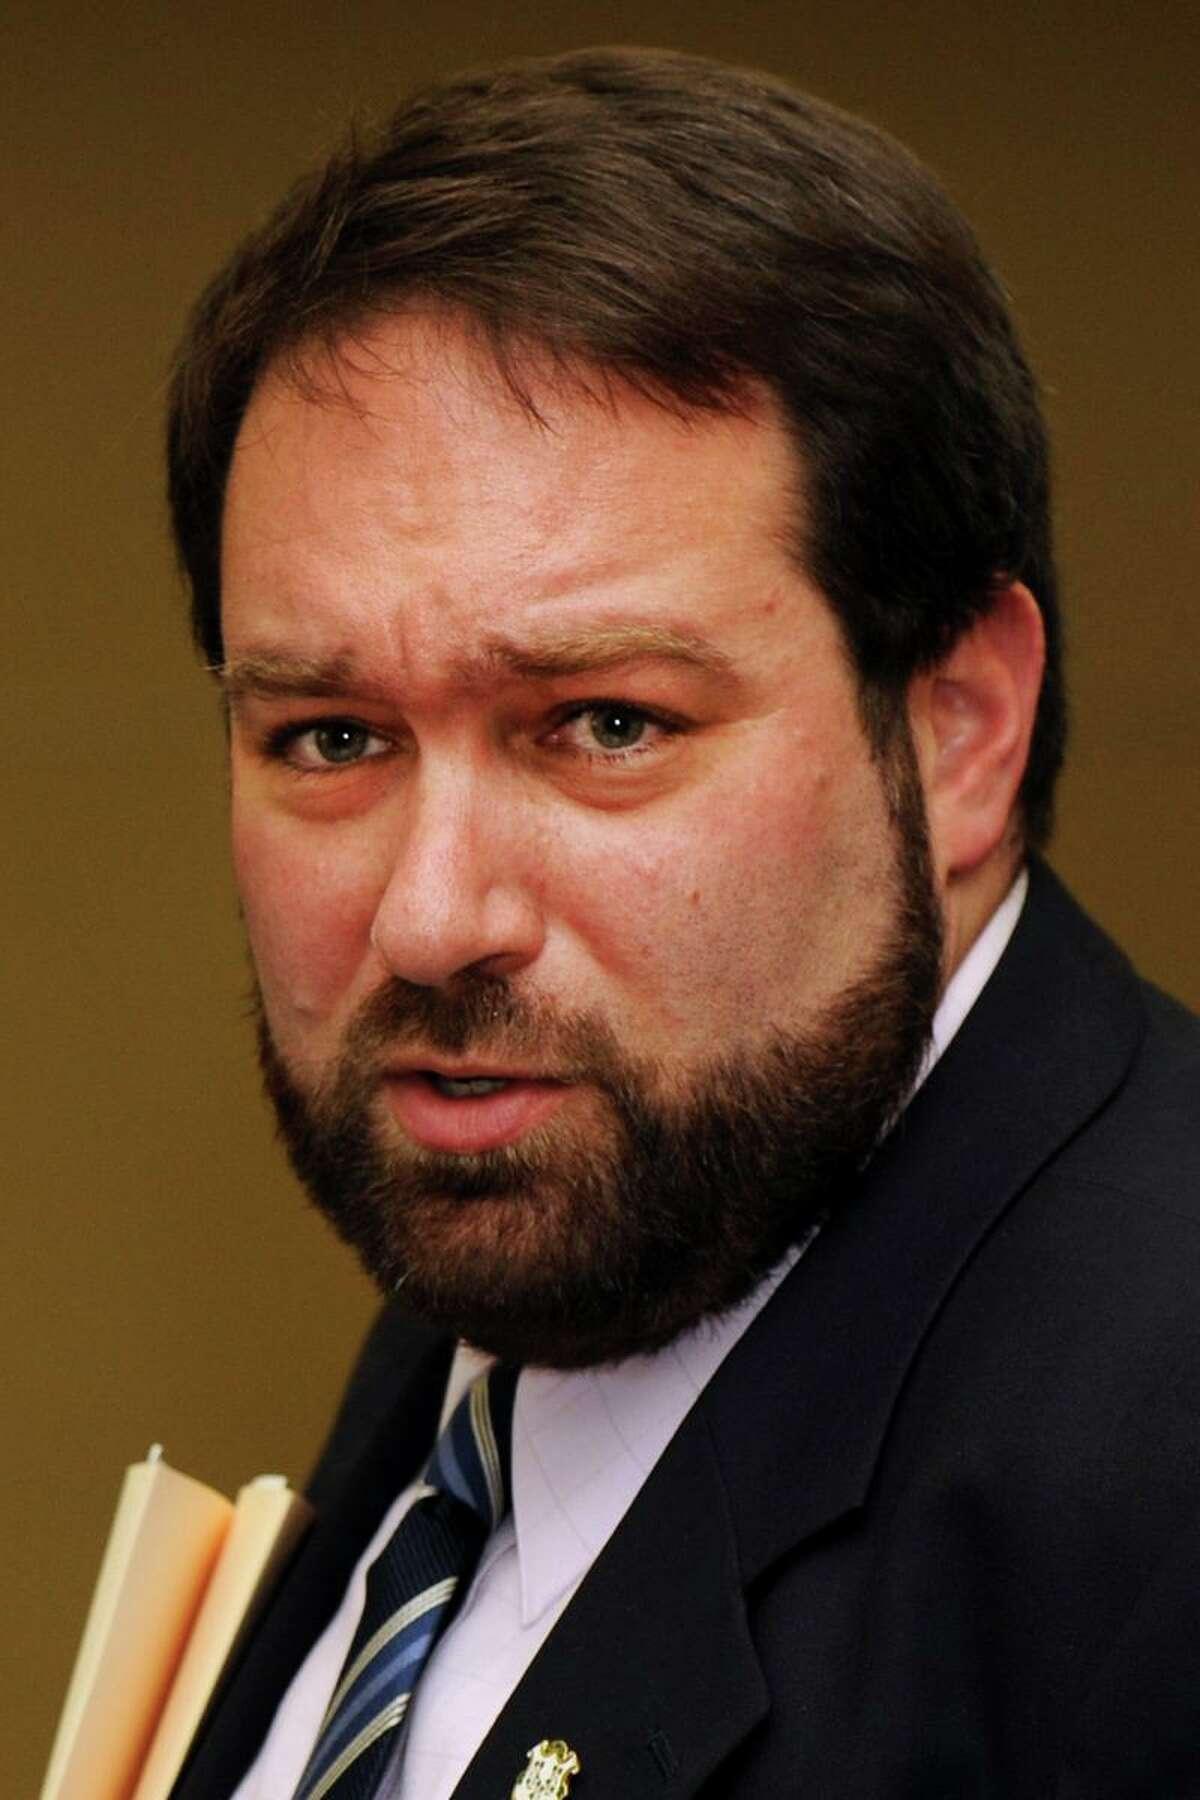 Av Harris has been filling in as spokesman for Bridgeport Mayor Joe Ganim.